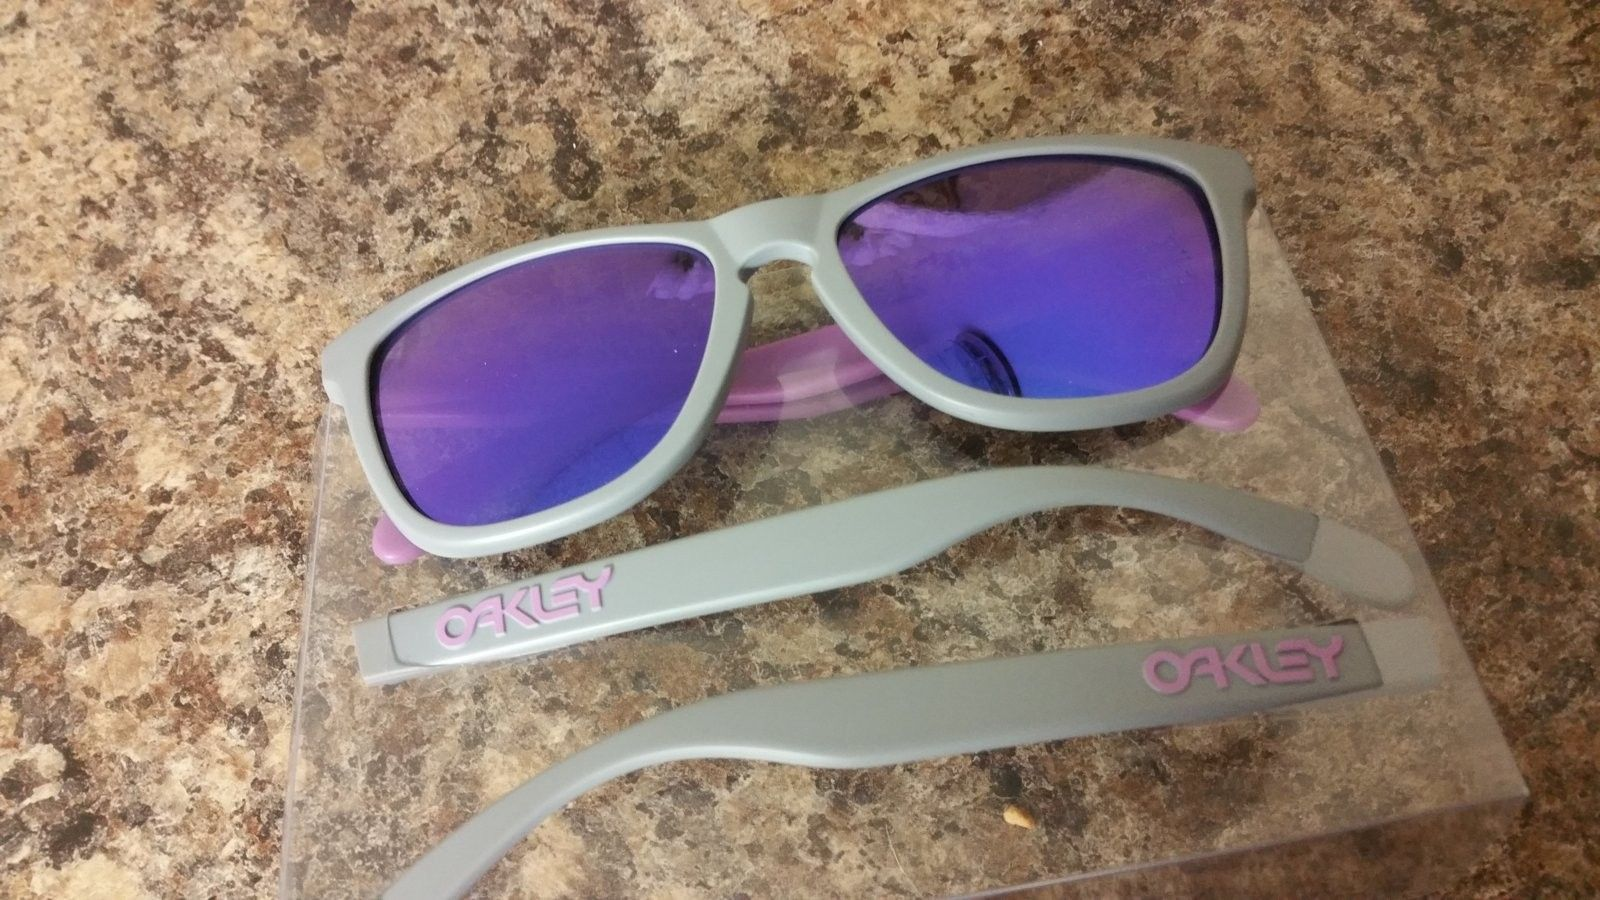 Matte Grey frames - too big for lenses? - 1472261698381-929451429.jpg